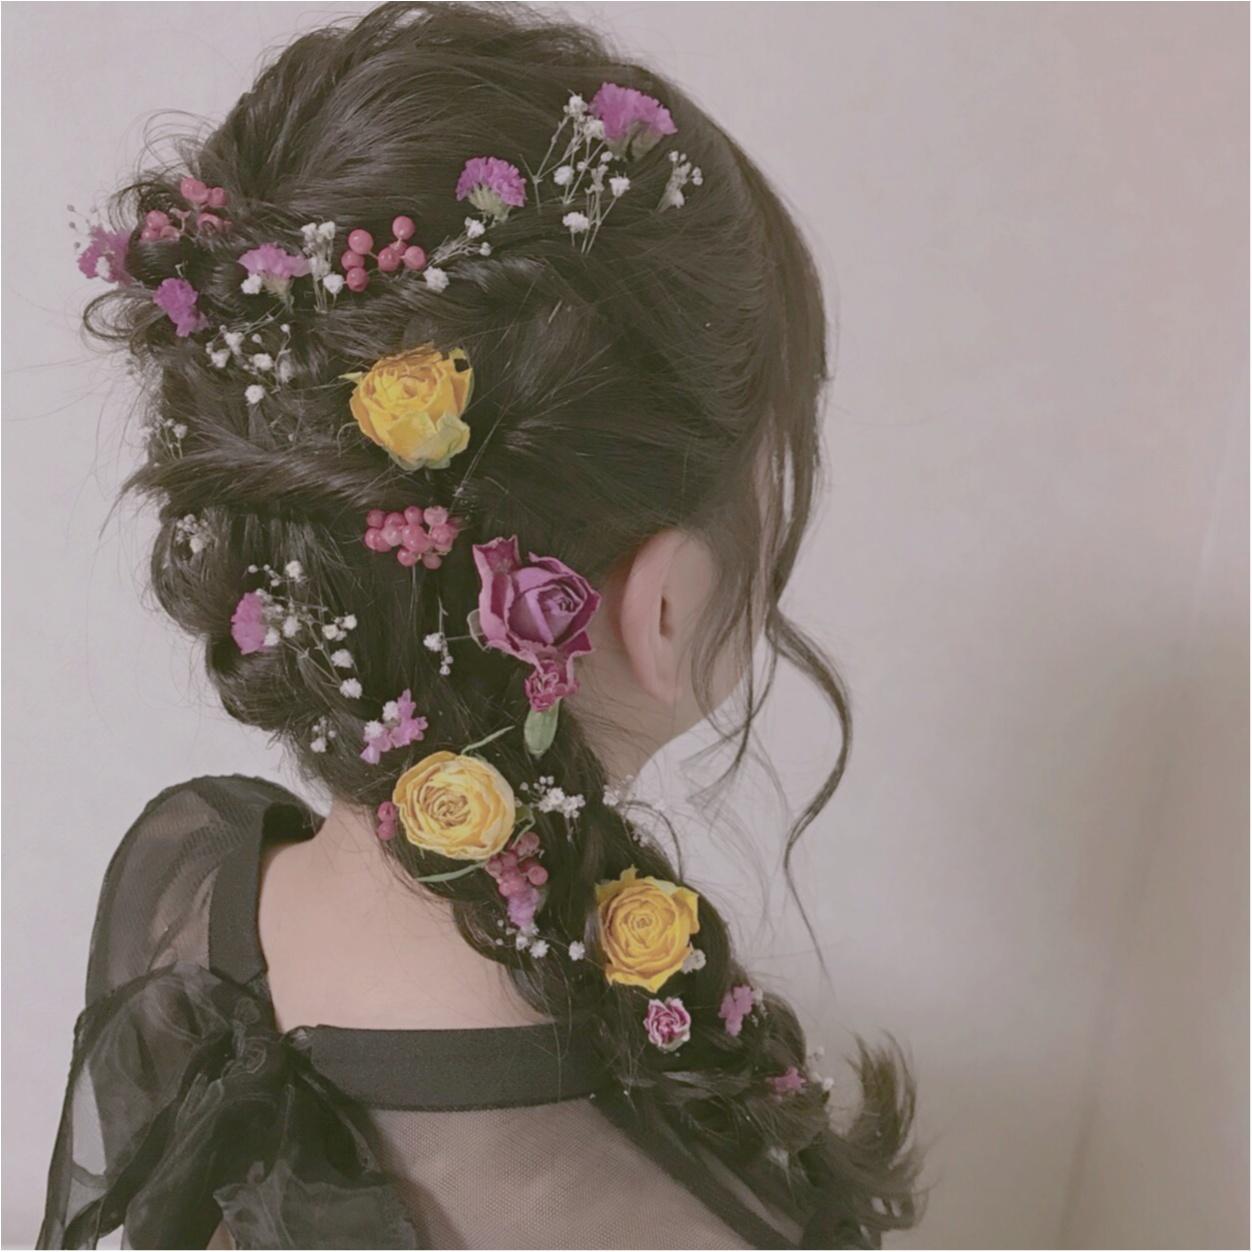 MORE大女子会❤︎素敵な方々との時間、ドライフラワーヘアアレンジなど紹介します!_5